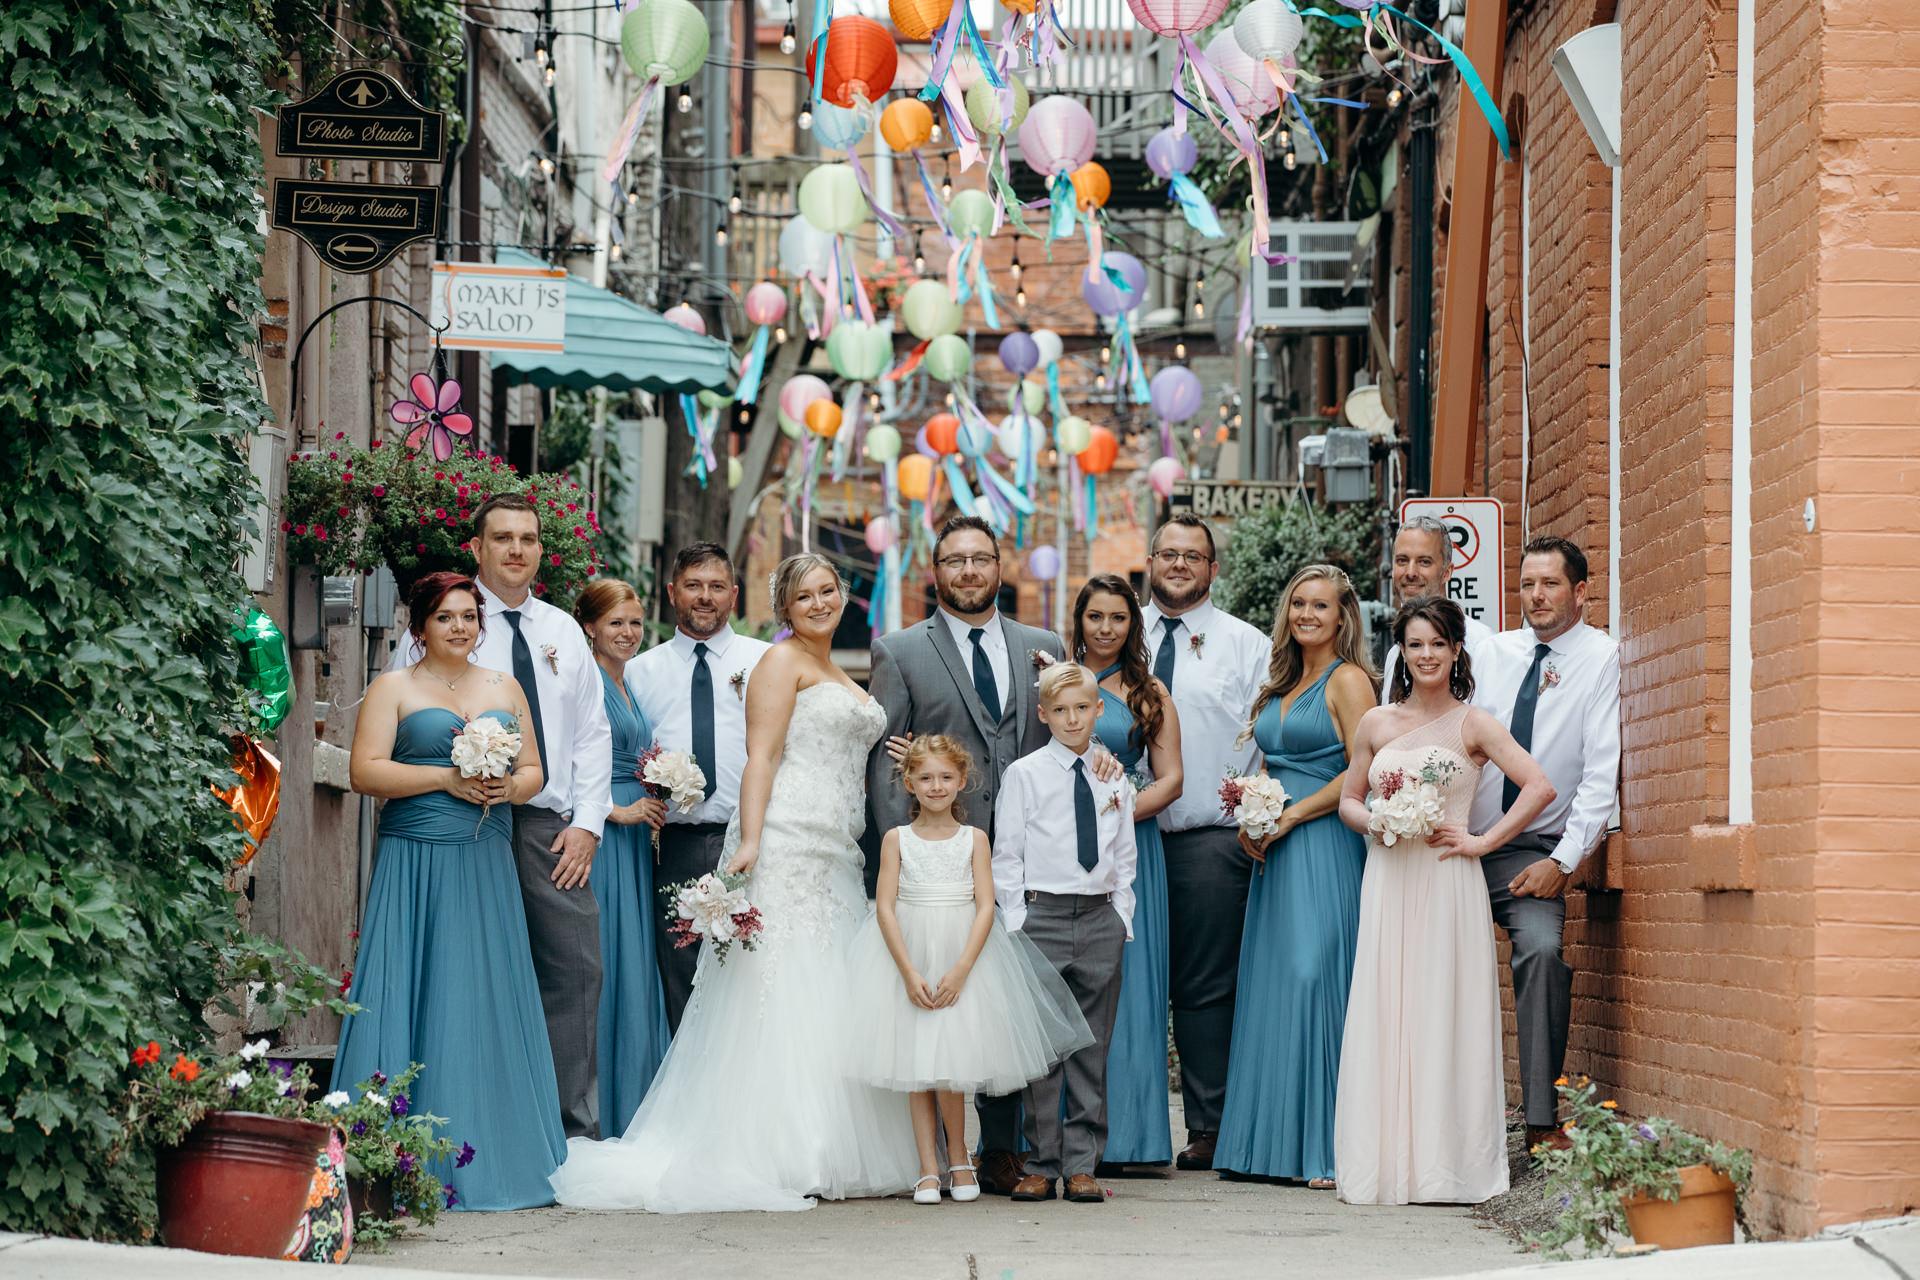 Grant Beachy Weddings photography elkhart south bend goshen warsaw-023.jpg